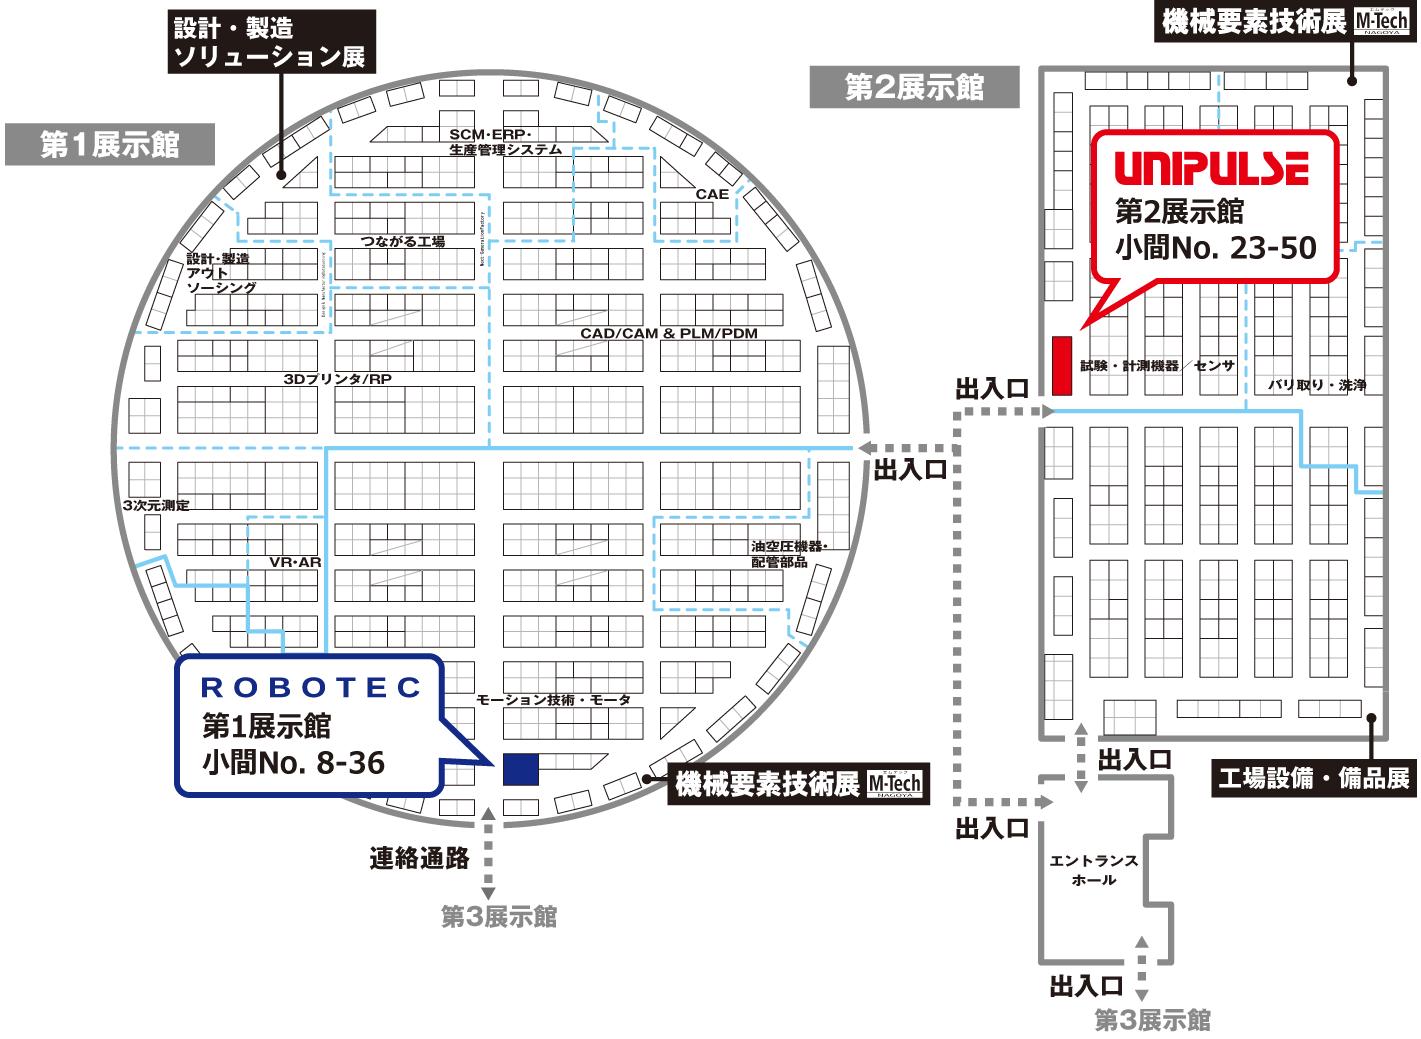 名古屋機械要素展の地図